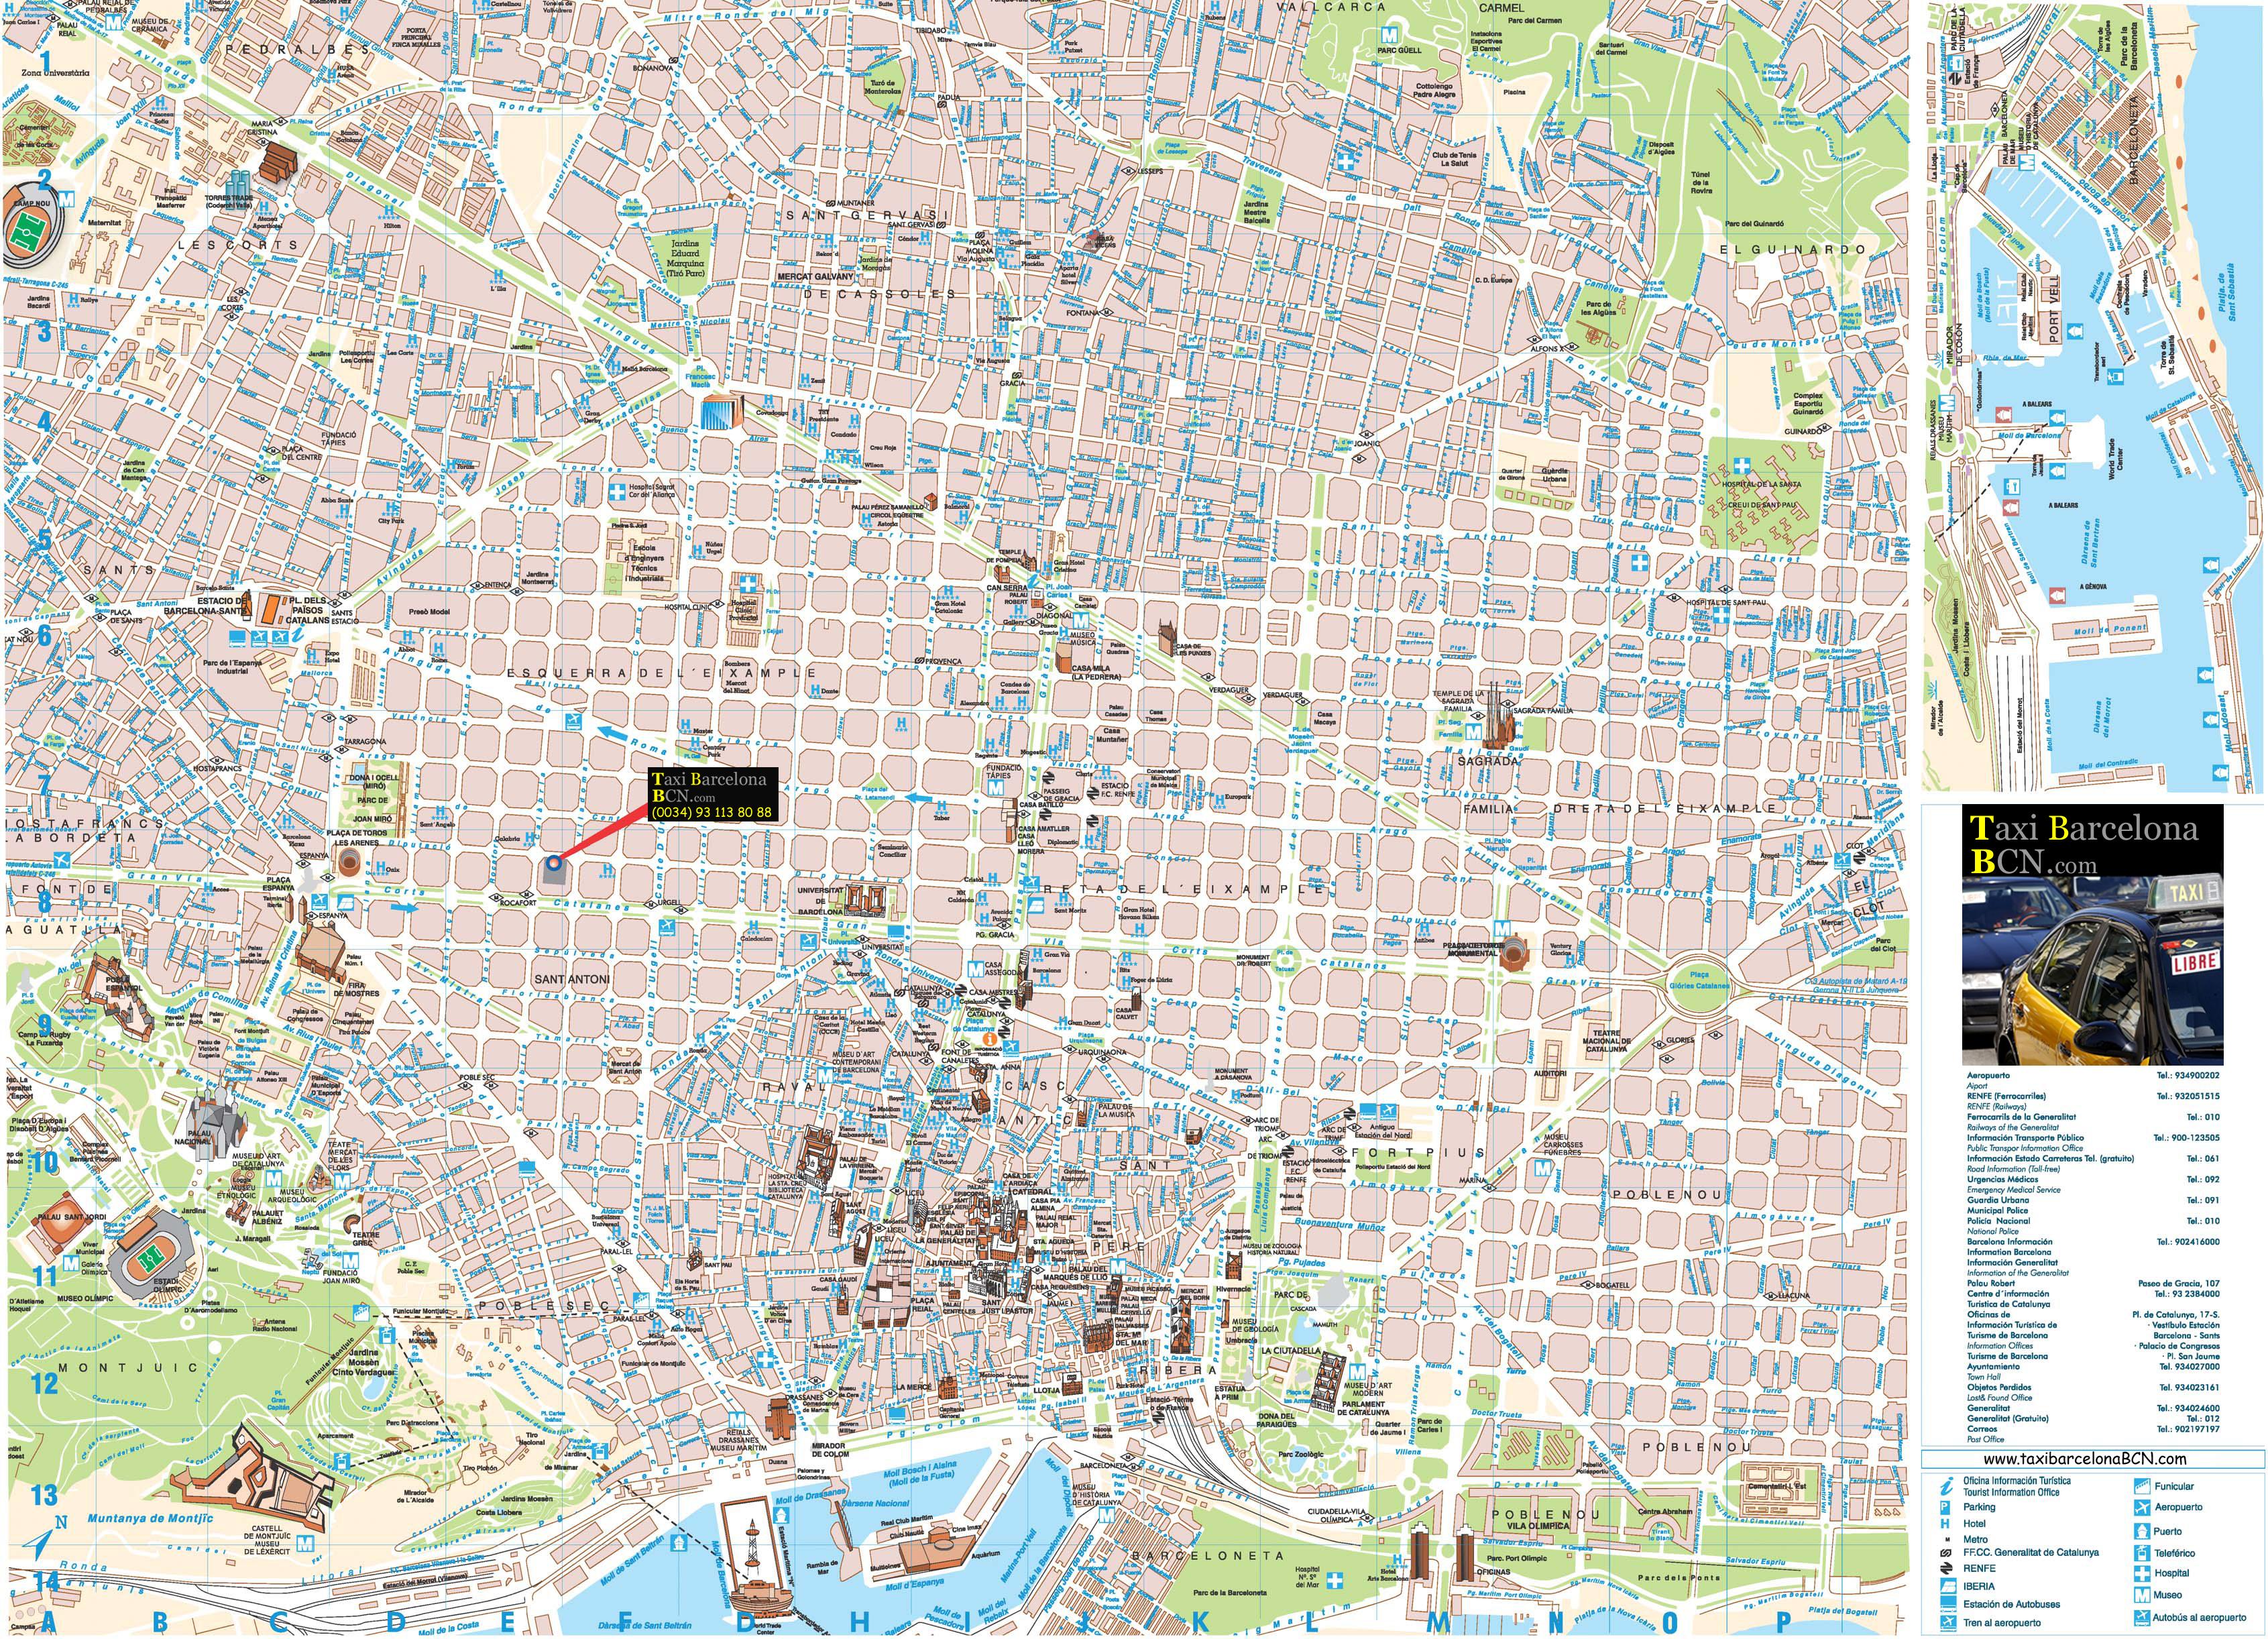 Tarifas Taxi Barcelona Lista de precios vigente 2010 – Barcelona Tourist Map Pdf